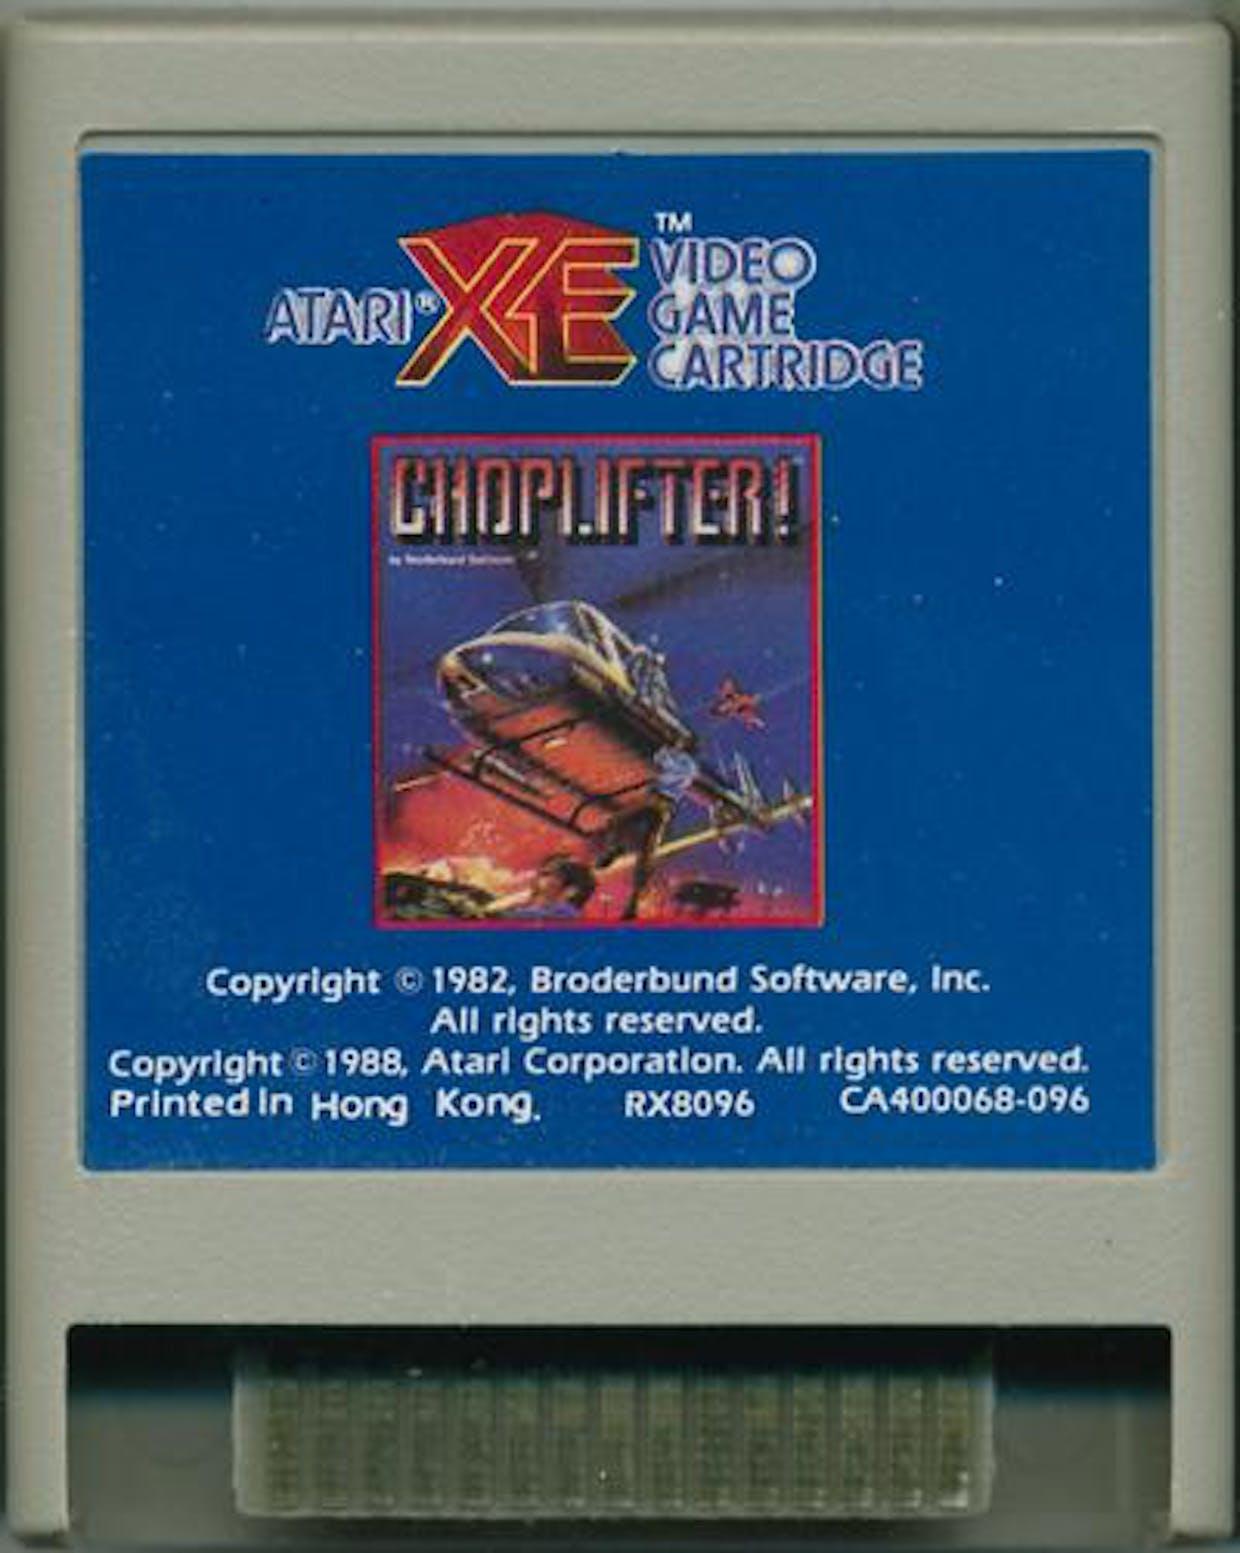 Image result for Choplifter XE atari